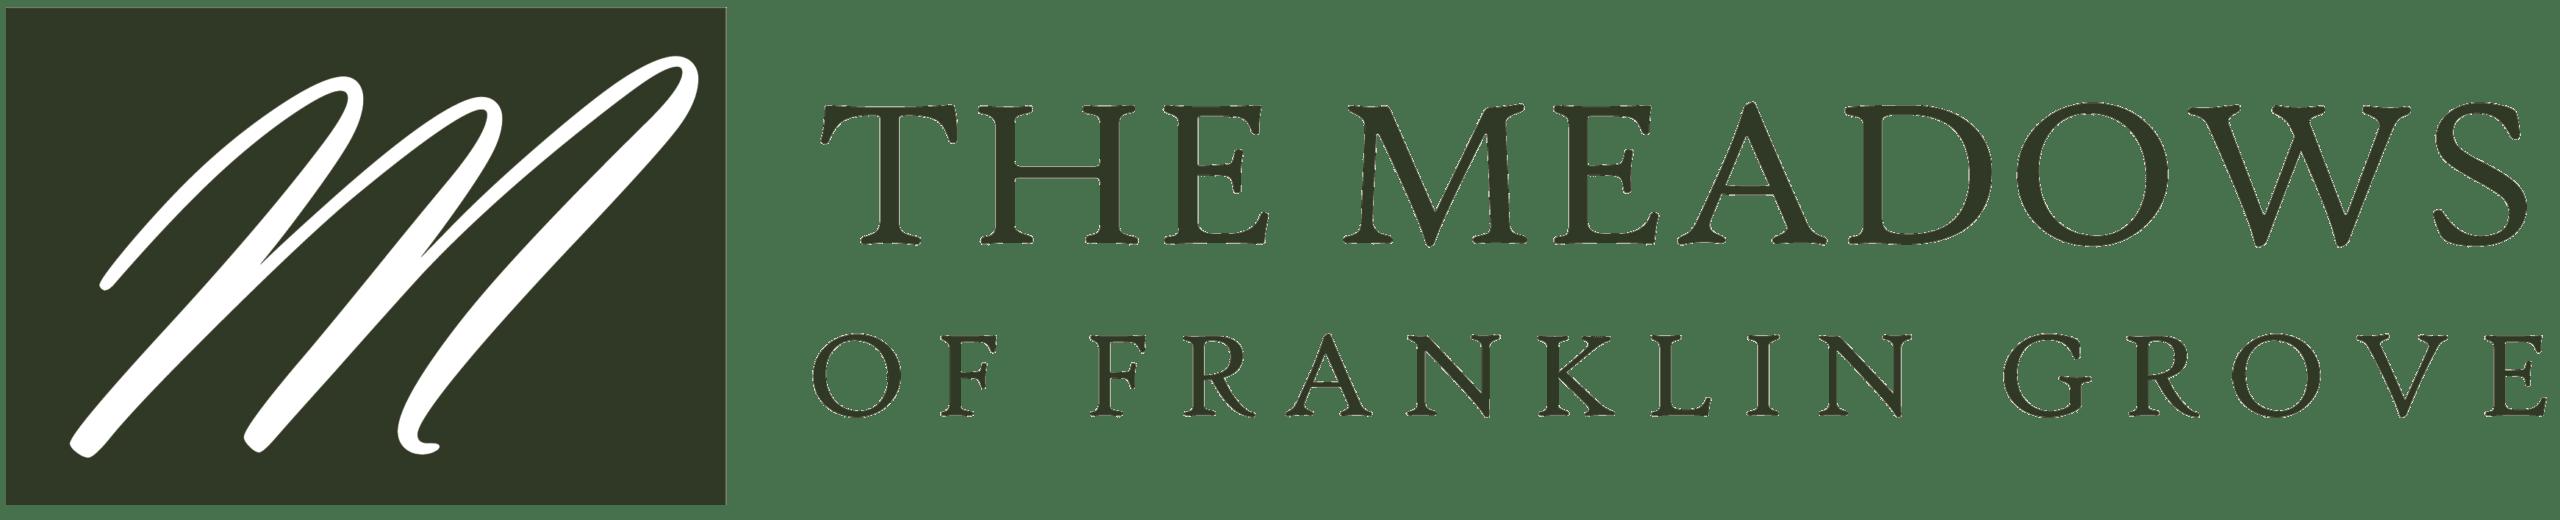 The Meadows of Franklin Grove